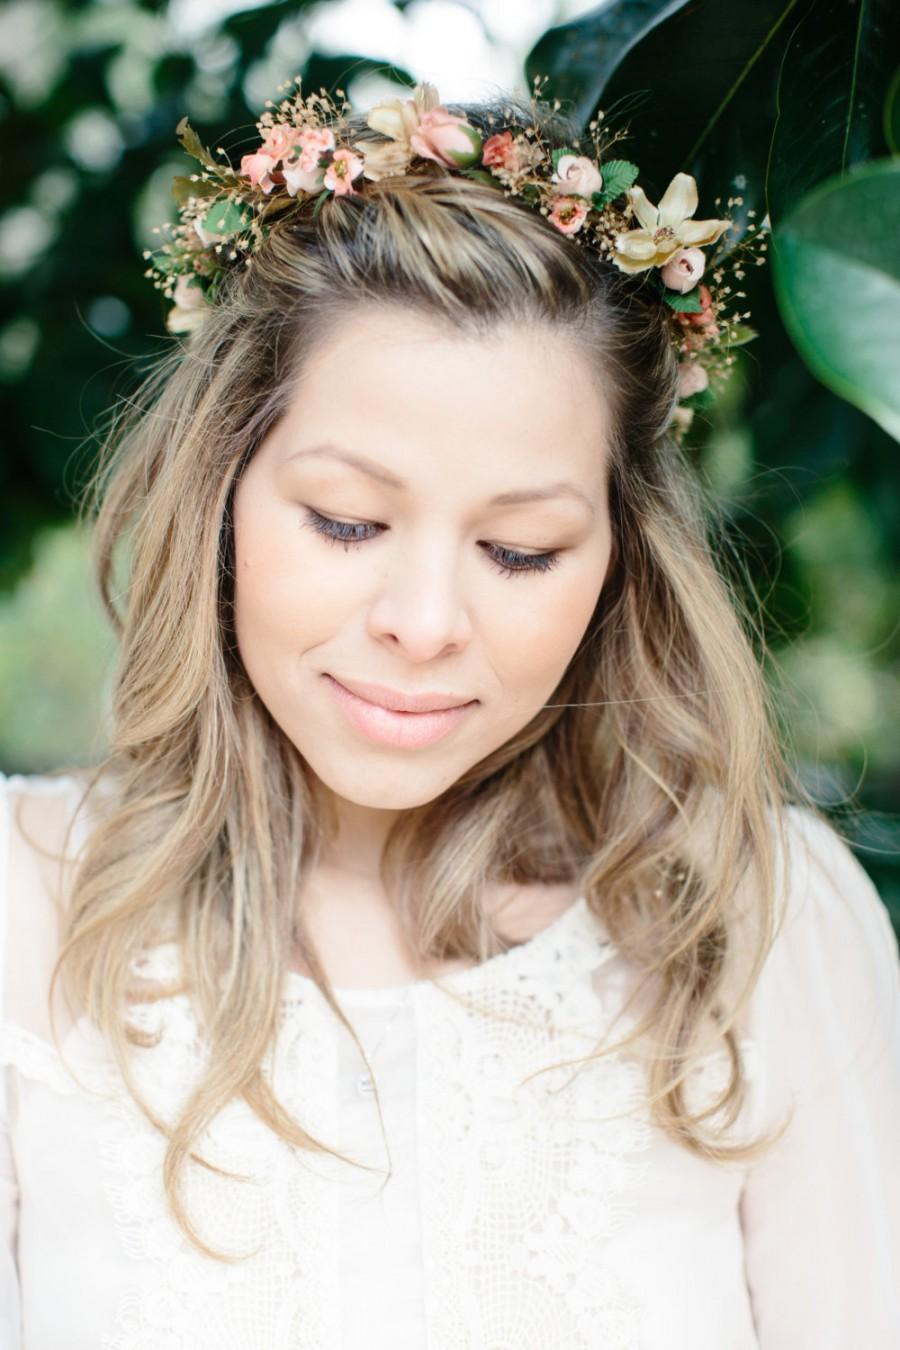 Wedding Flower crown peach Woodland Bridal party dried Floral fall hair  wreath Accessories girl halo Fairy circlet champagne babys breath f19f1489cf6